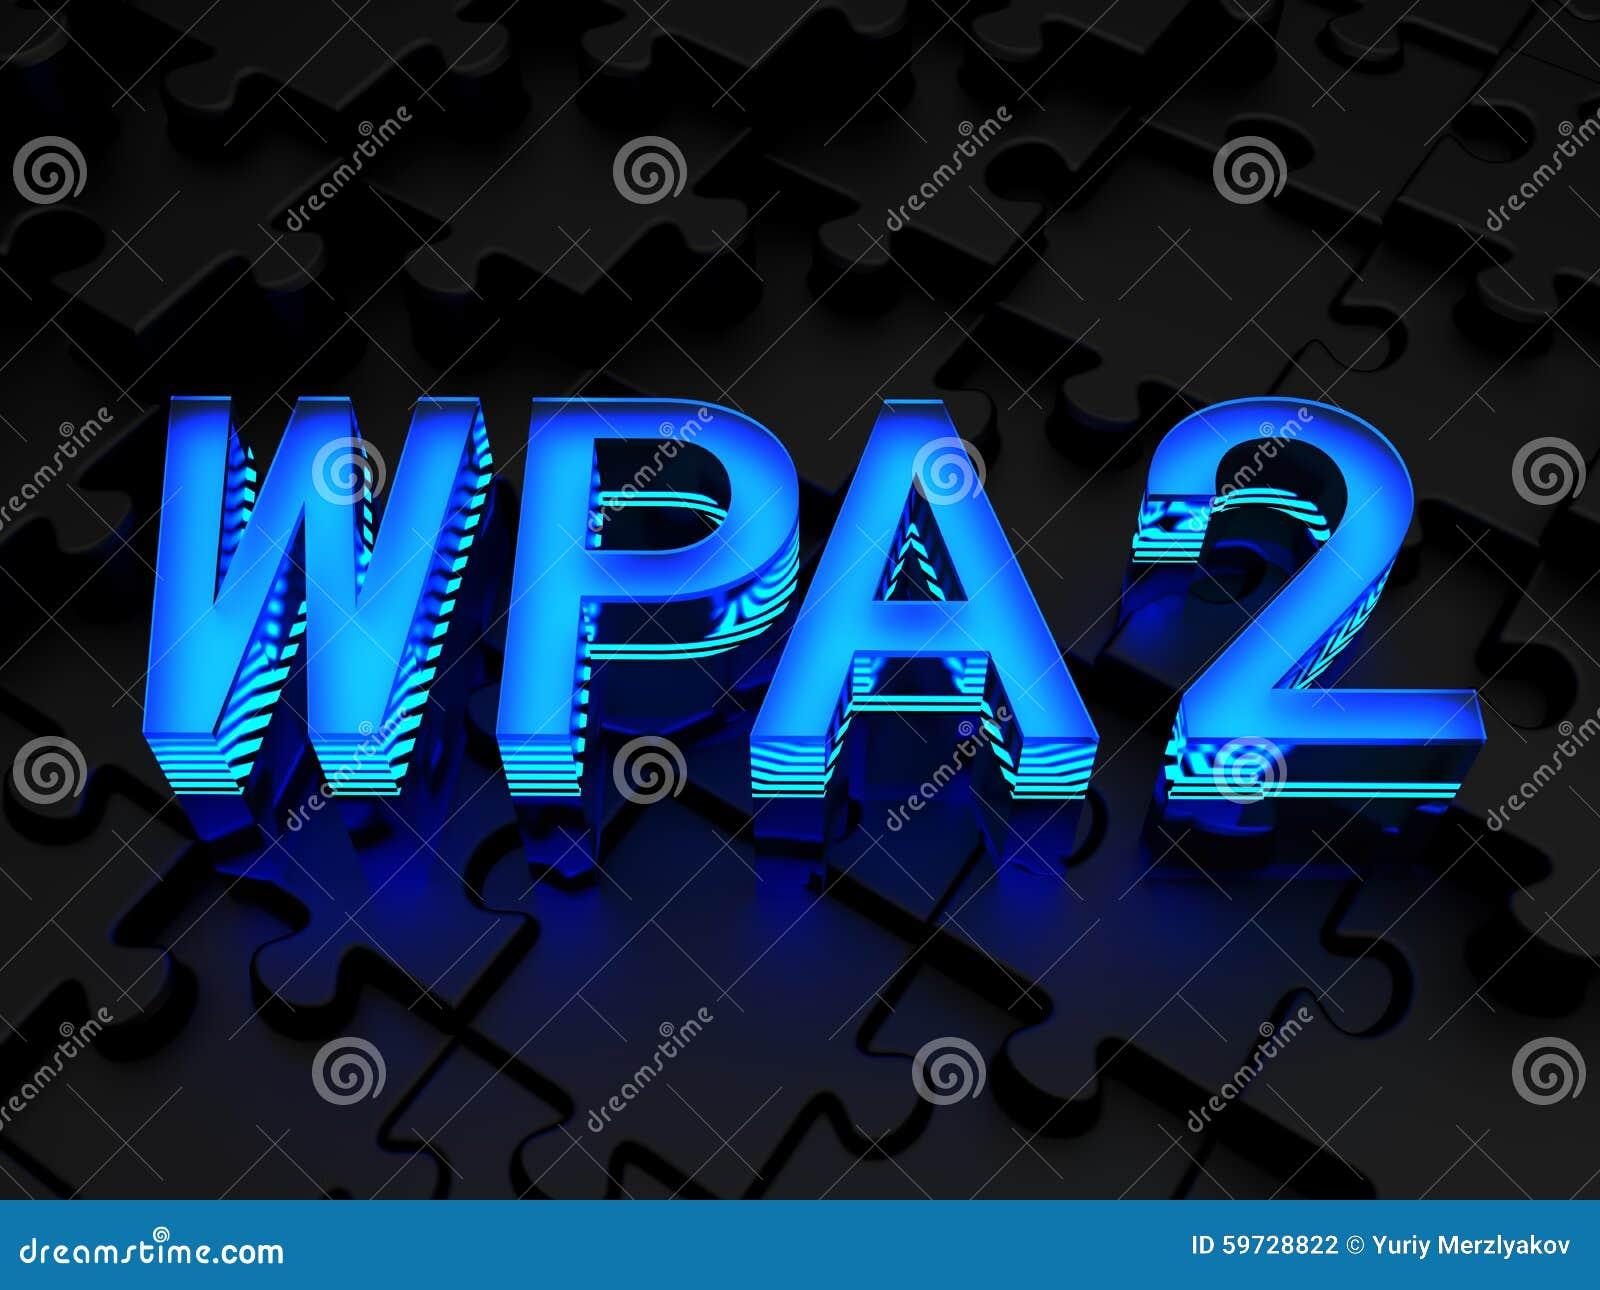 WPA2 (Wi-Fi Protected Access) ...